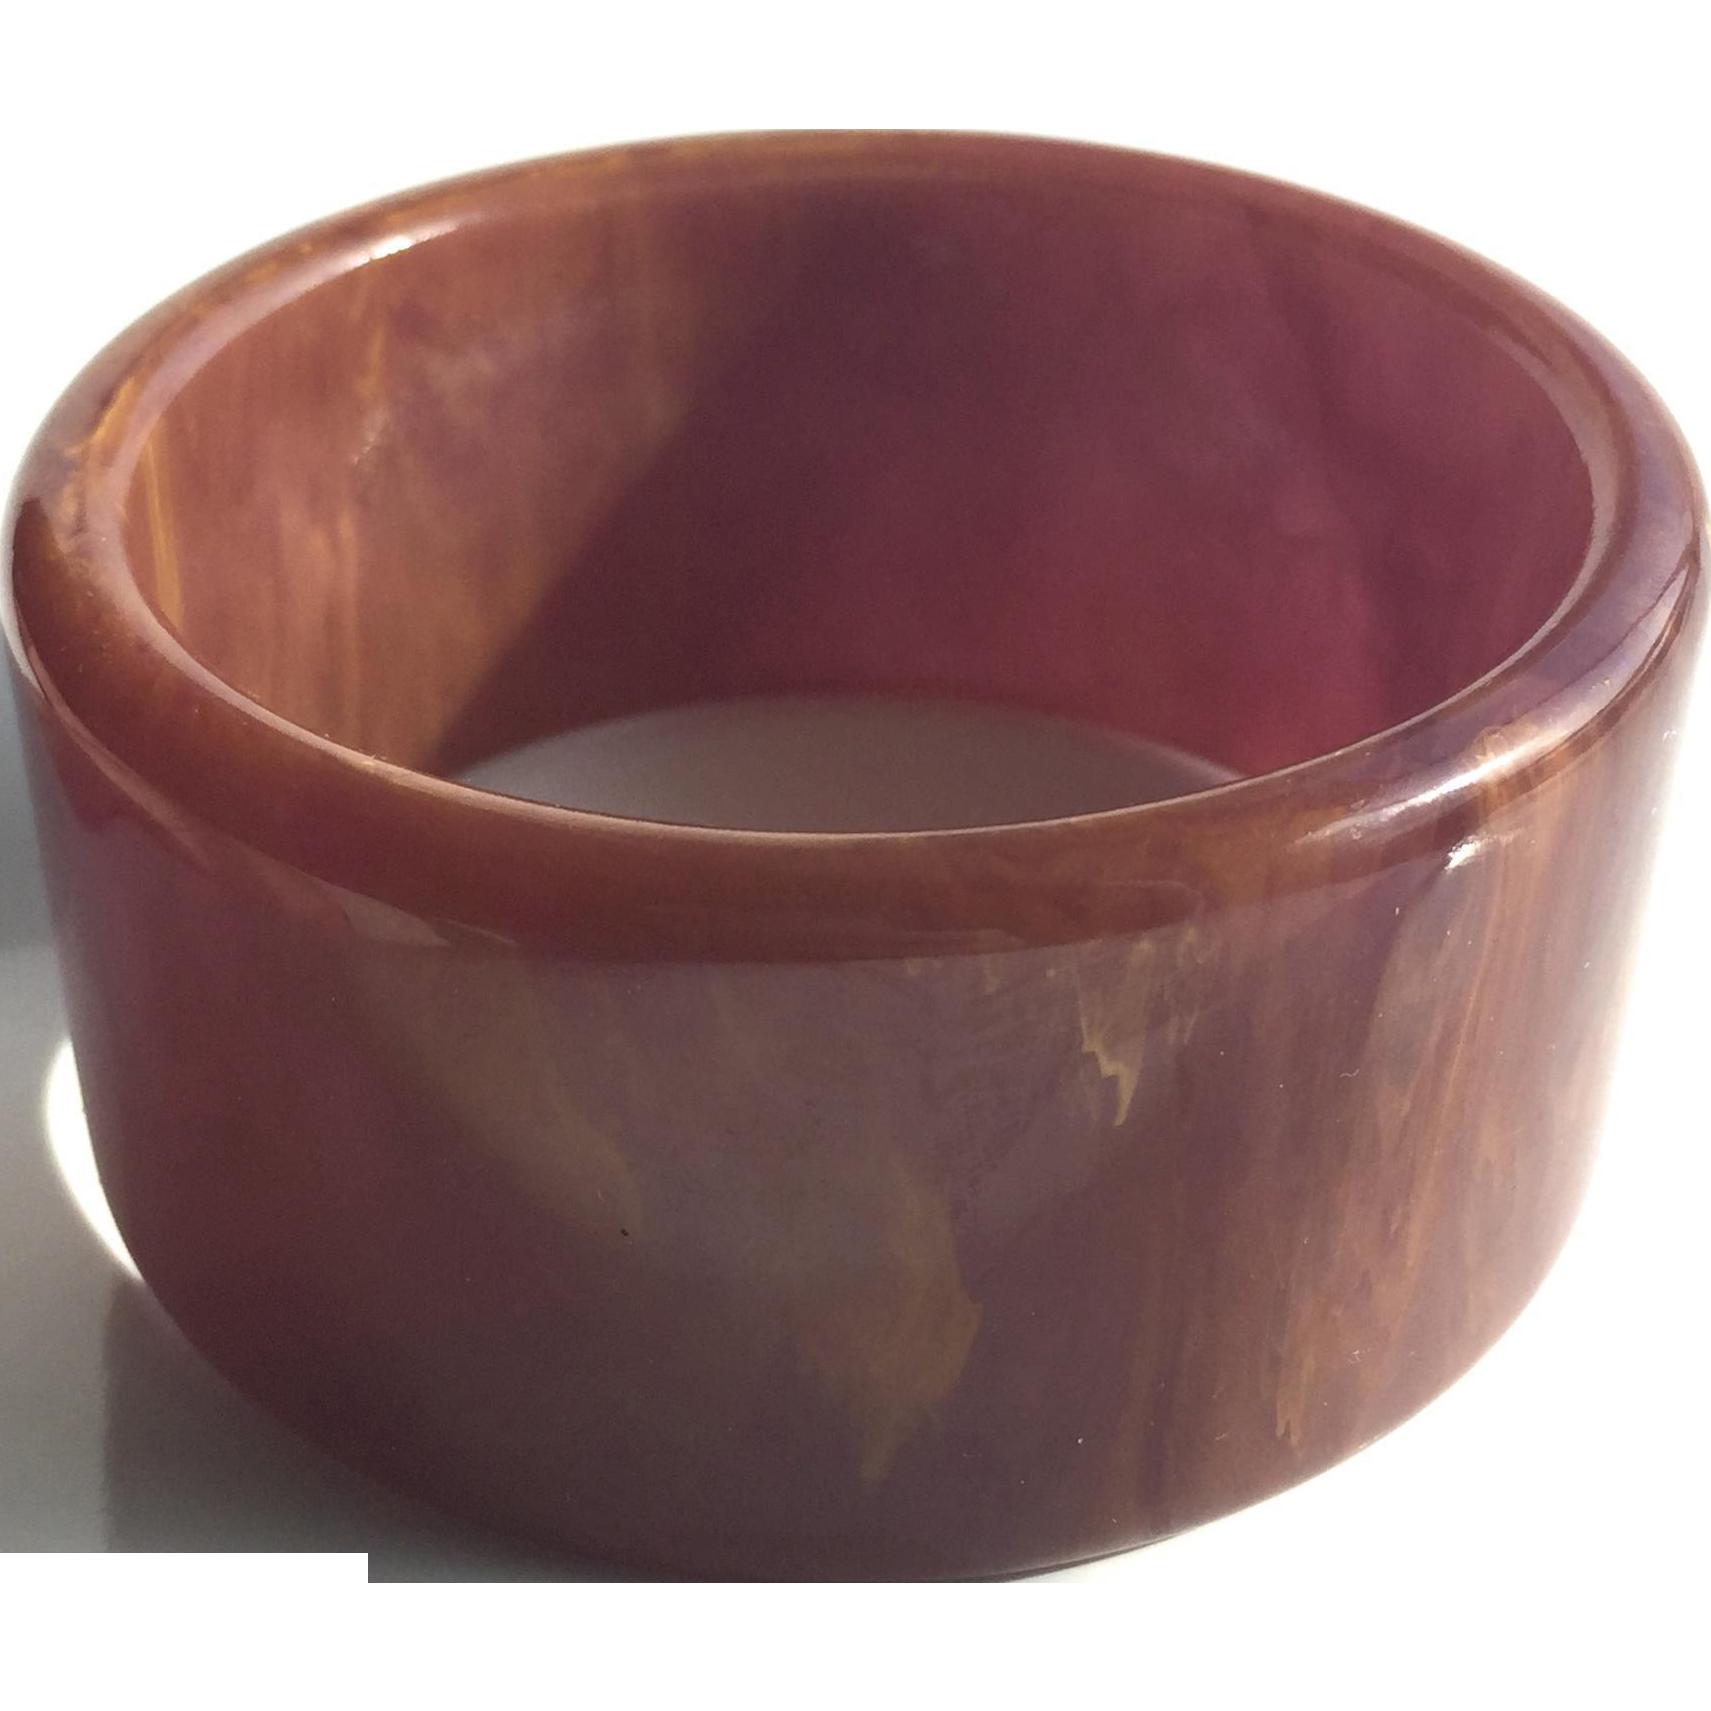 Bakelite Bangle Bracelet Heavily Marbled and Wide